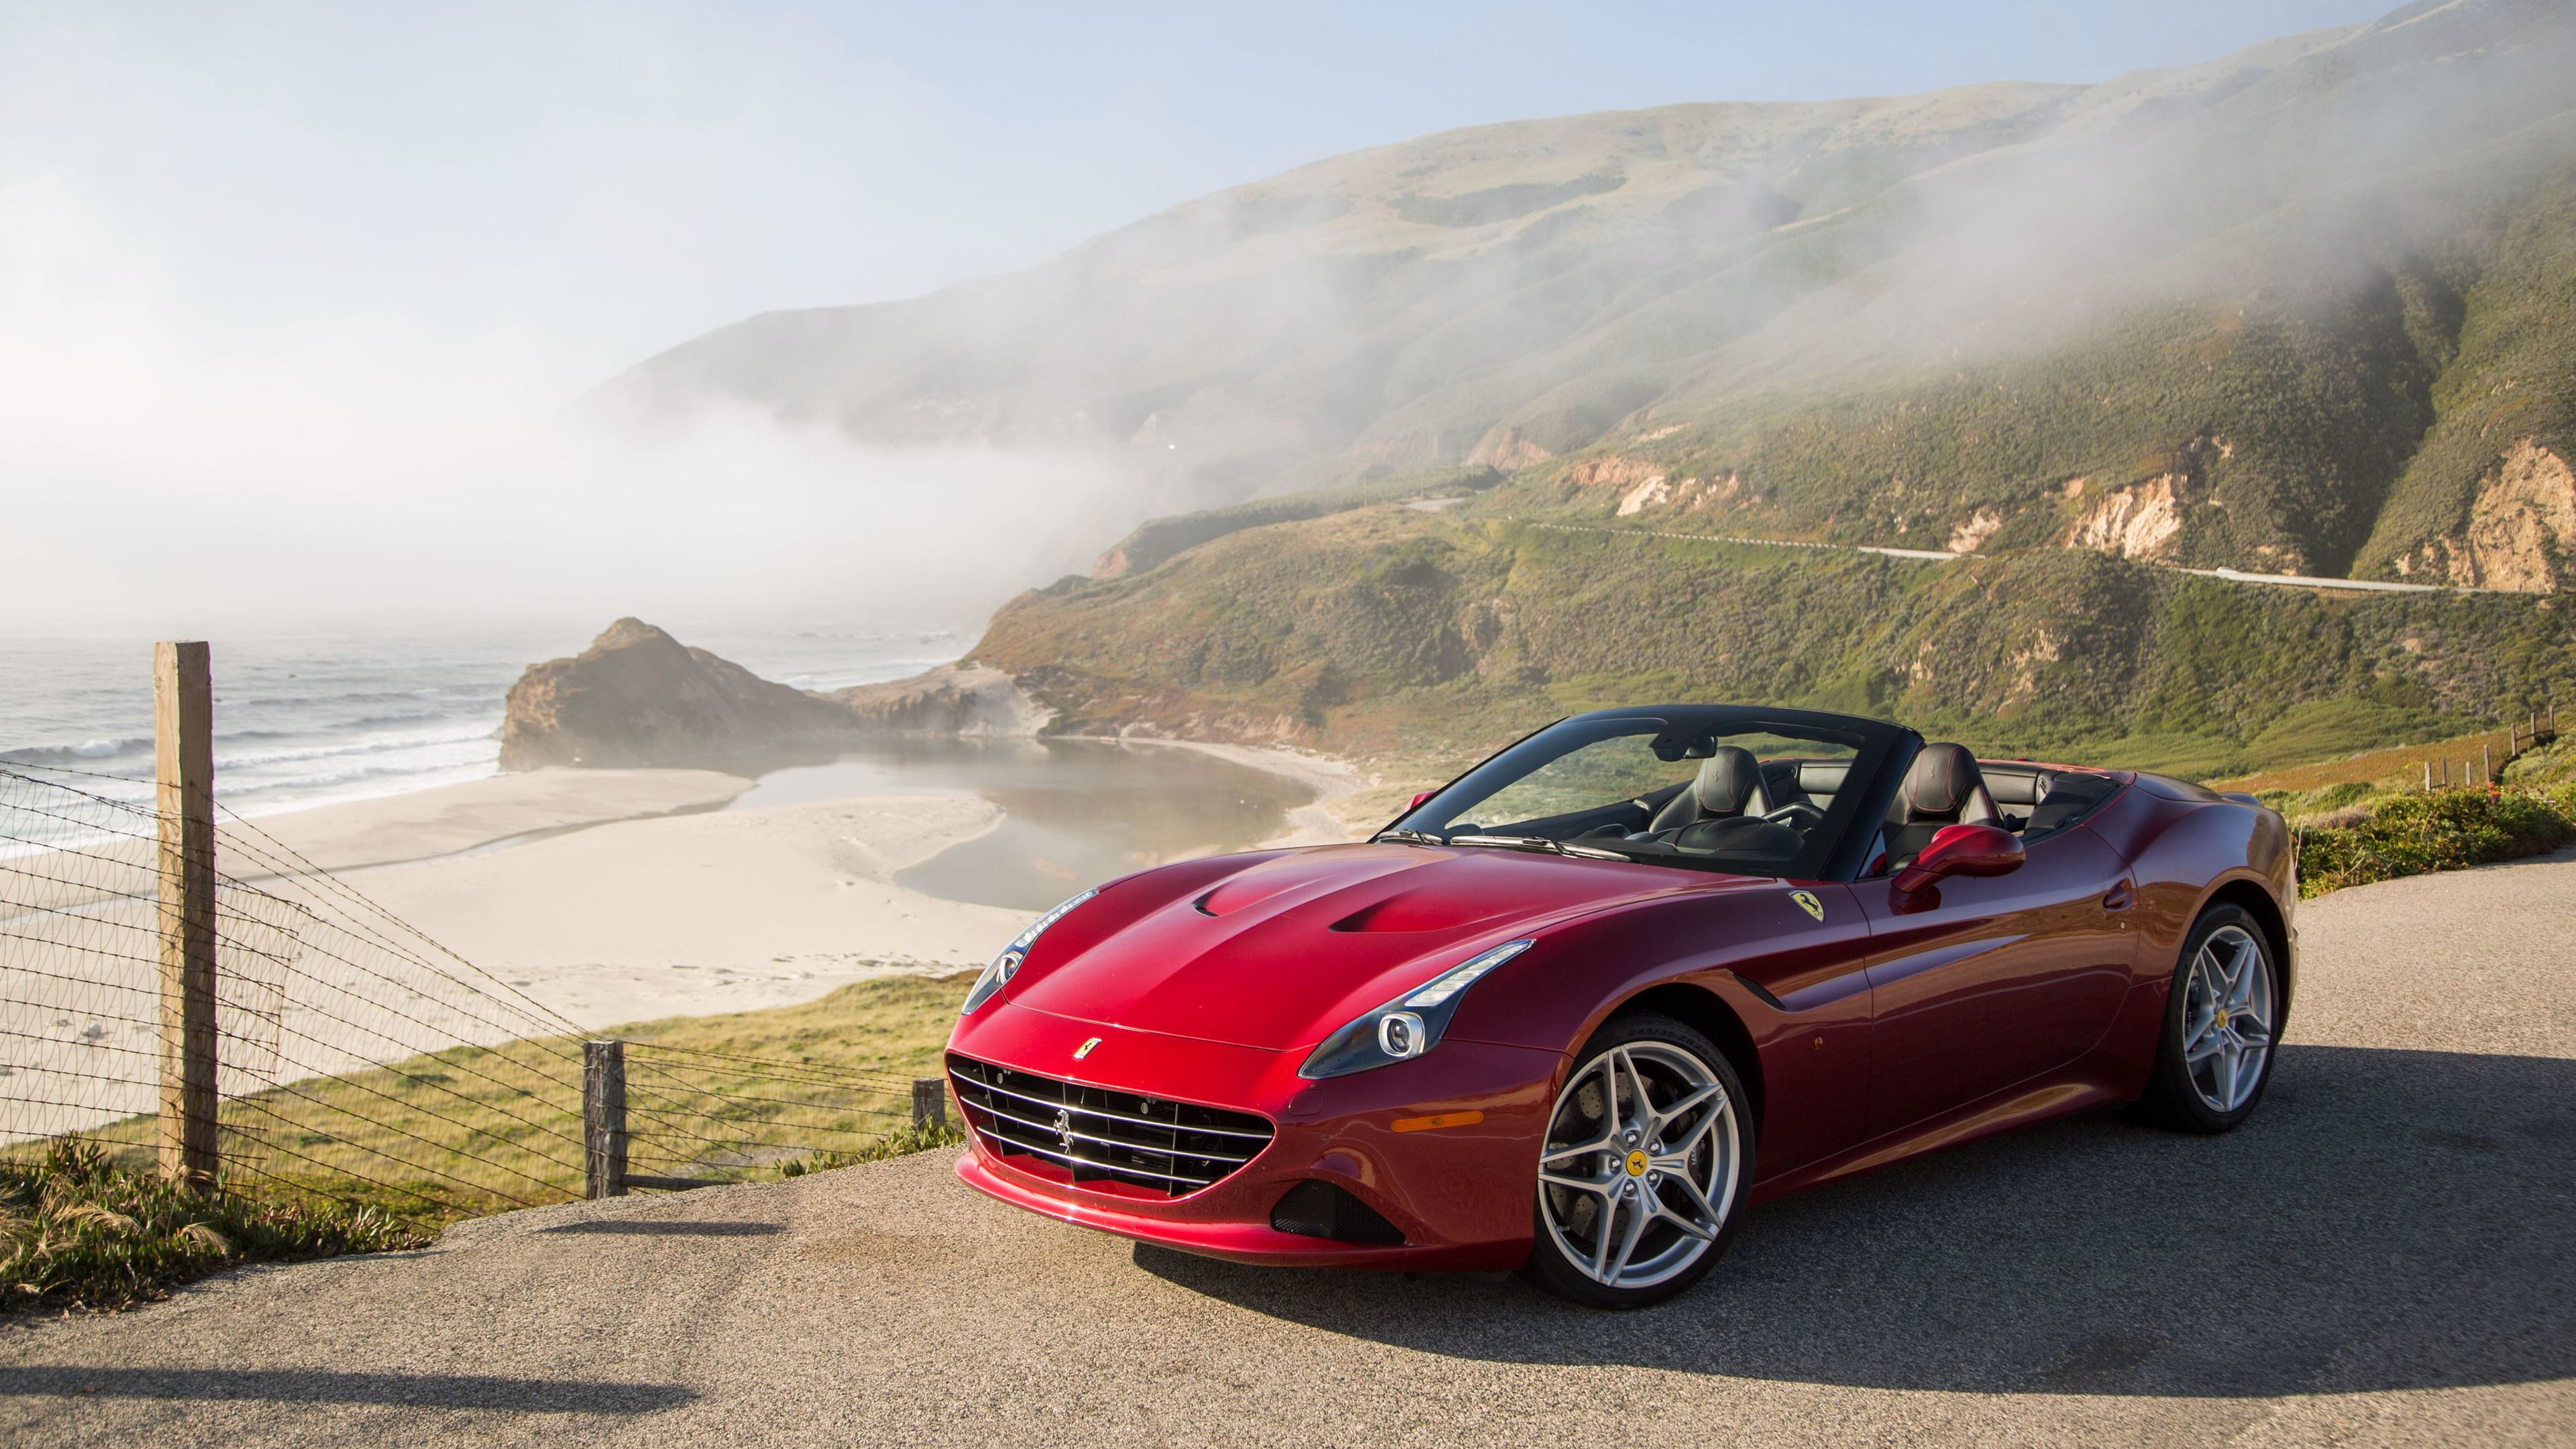 ferrari california 4k 1539104733 - Ferrari California 4k - ferrari wallpapers, ferrari california wallpapers, cars wallpapers, 4k-wallpapers